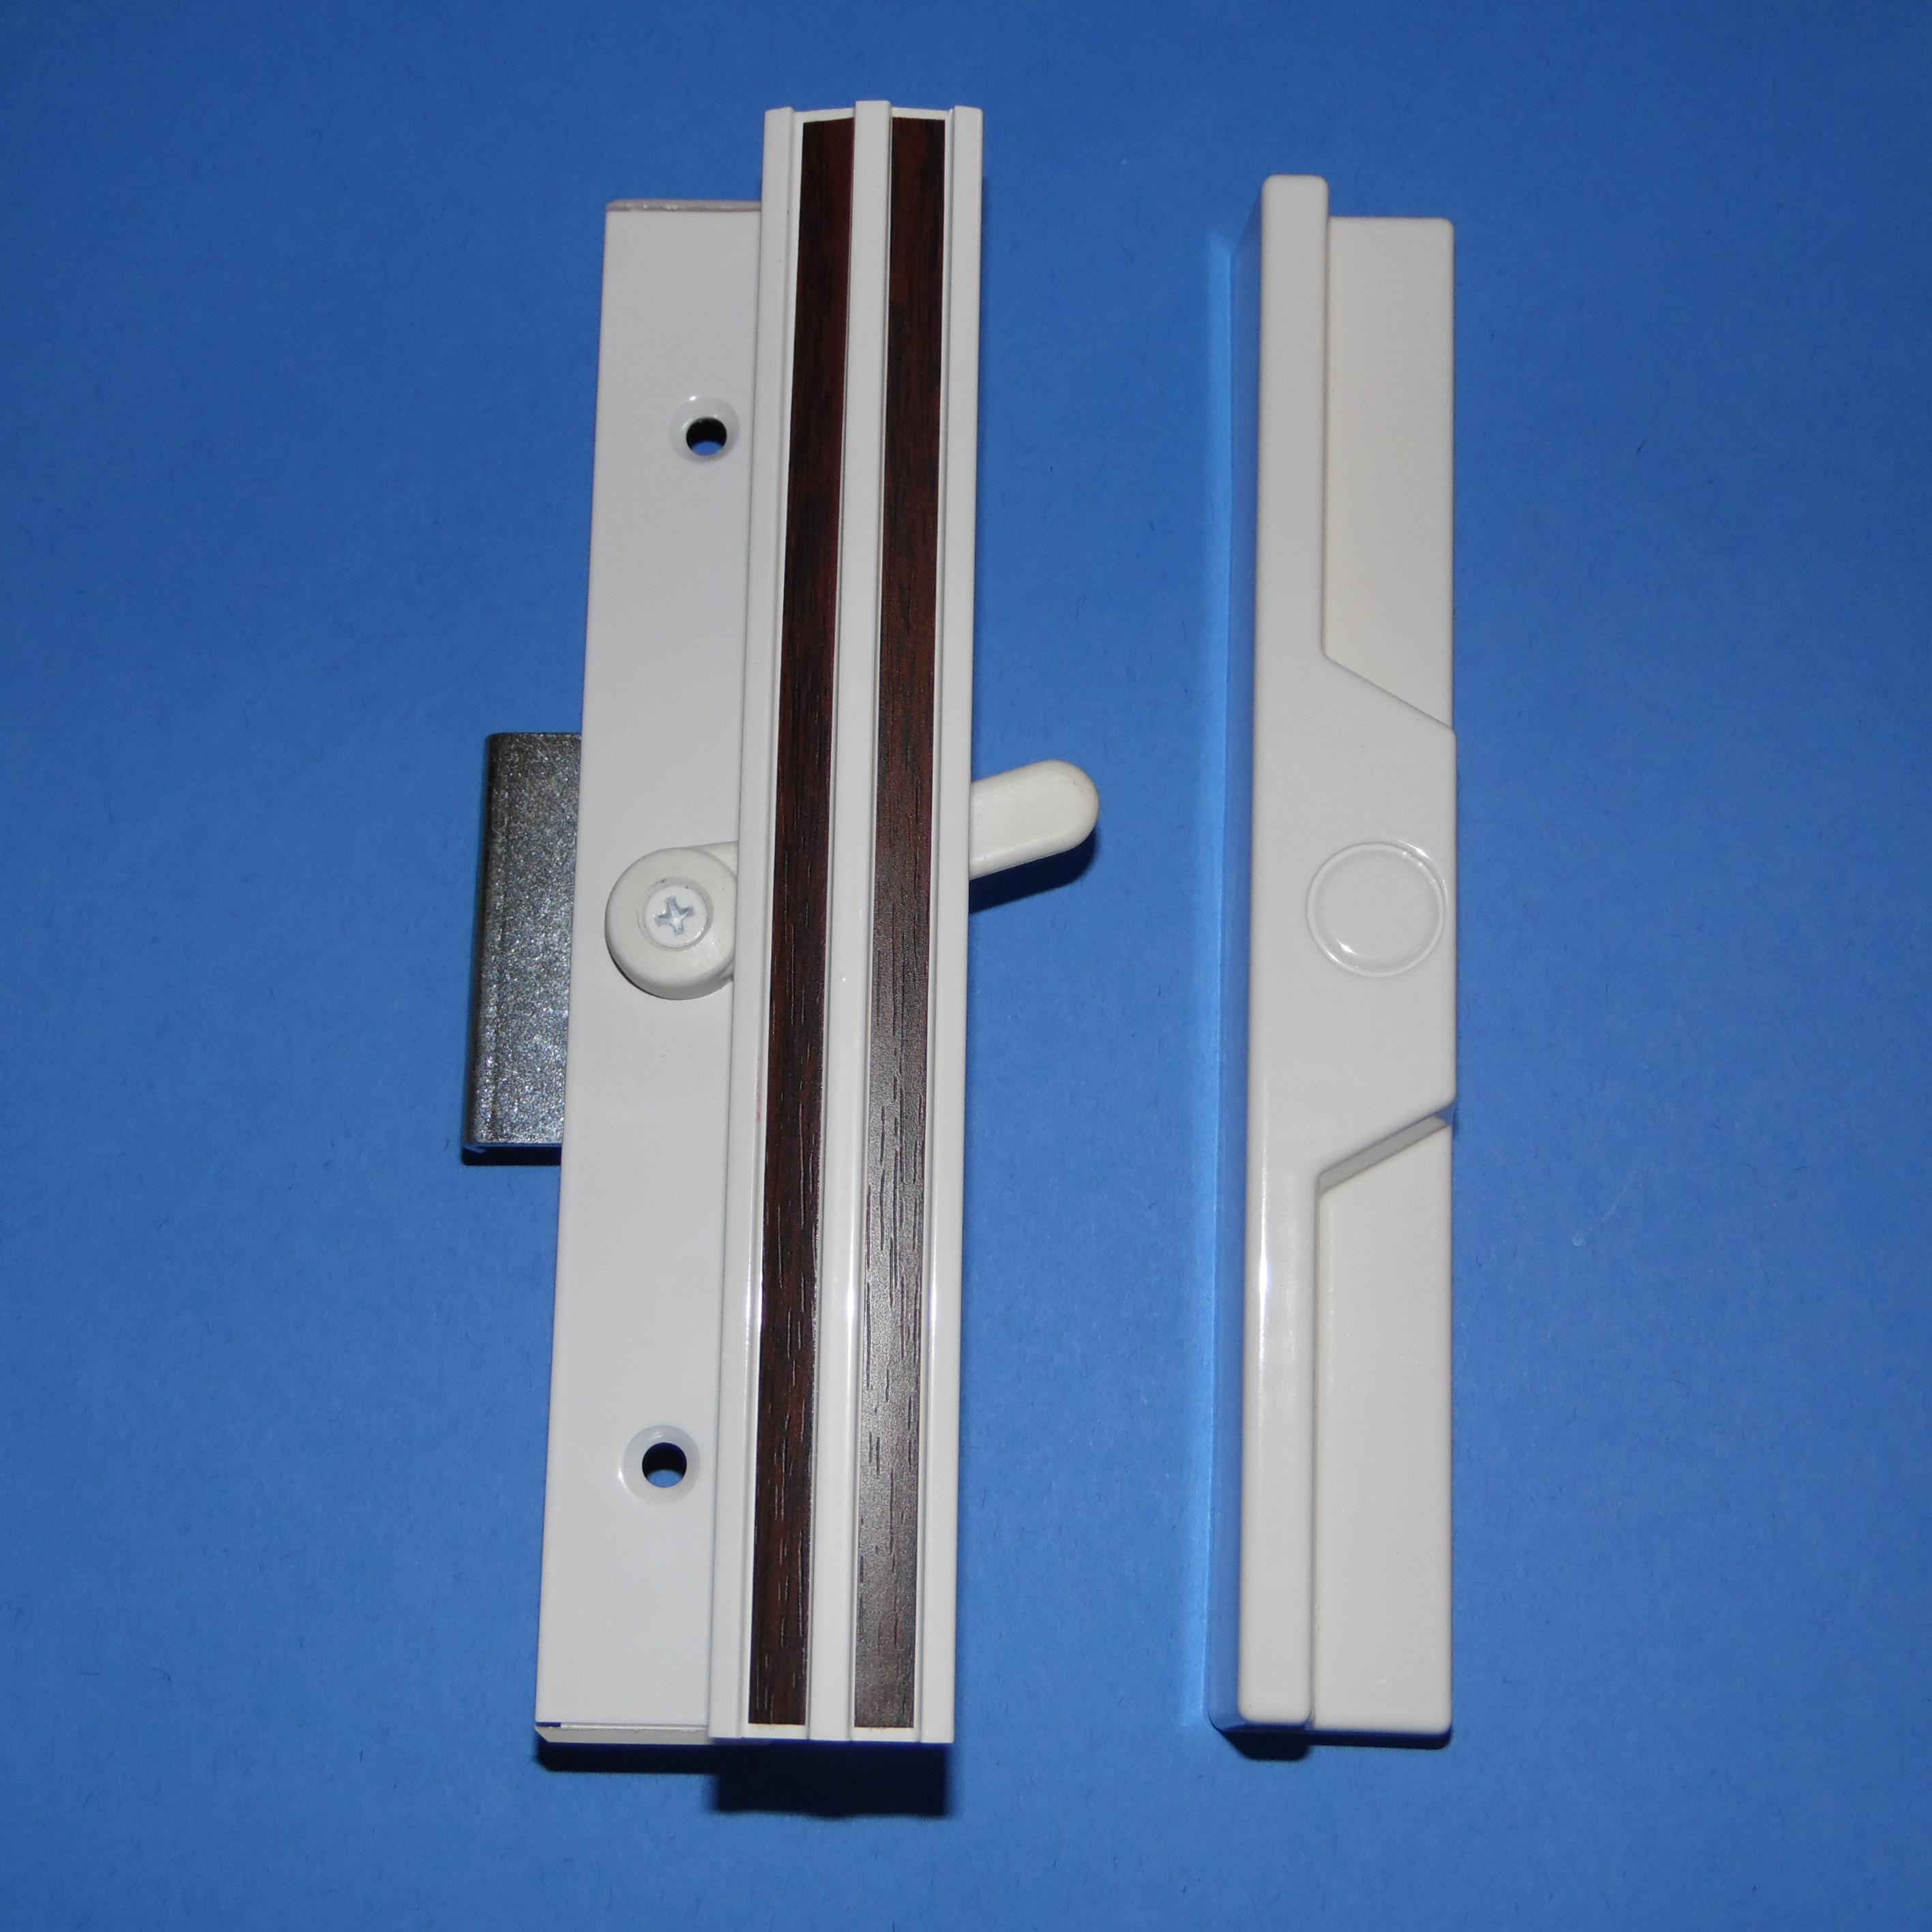 Patio Repair Screen Patio Door Handle 13-271 White - Window Repair Parts